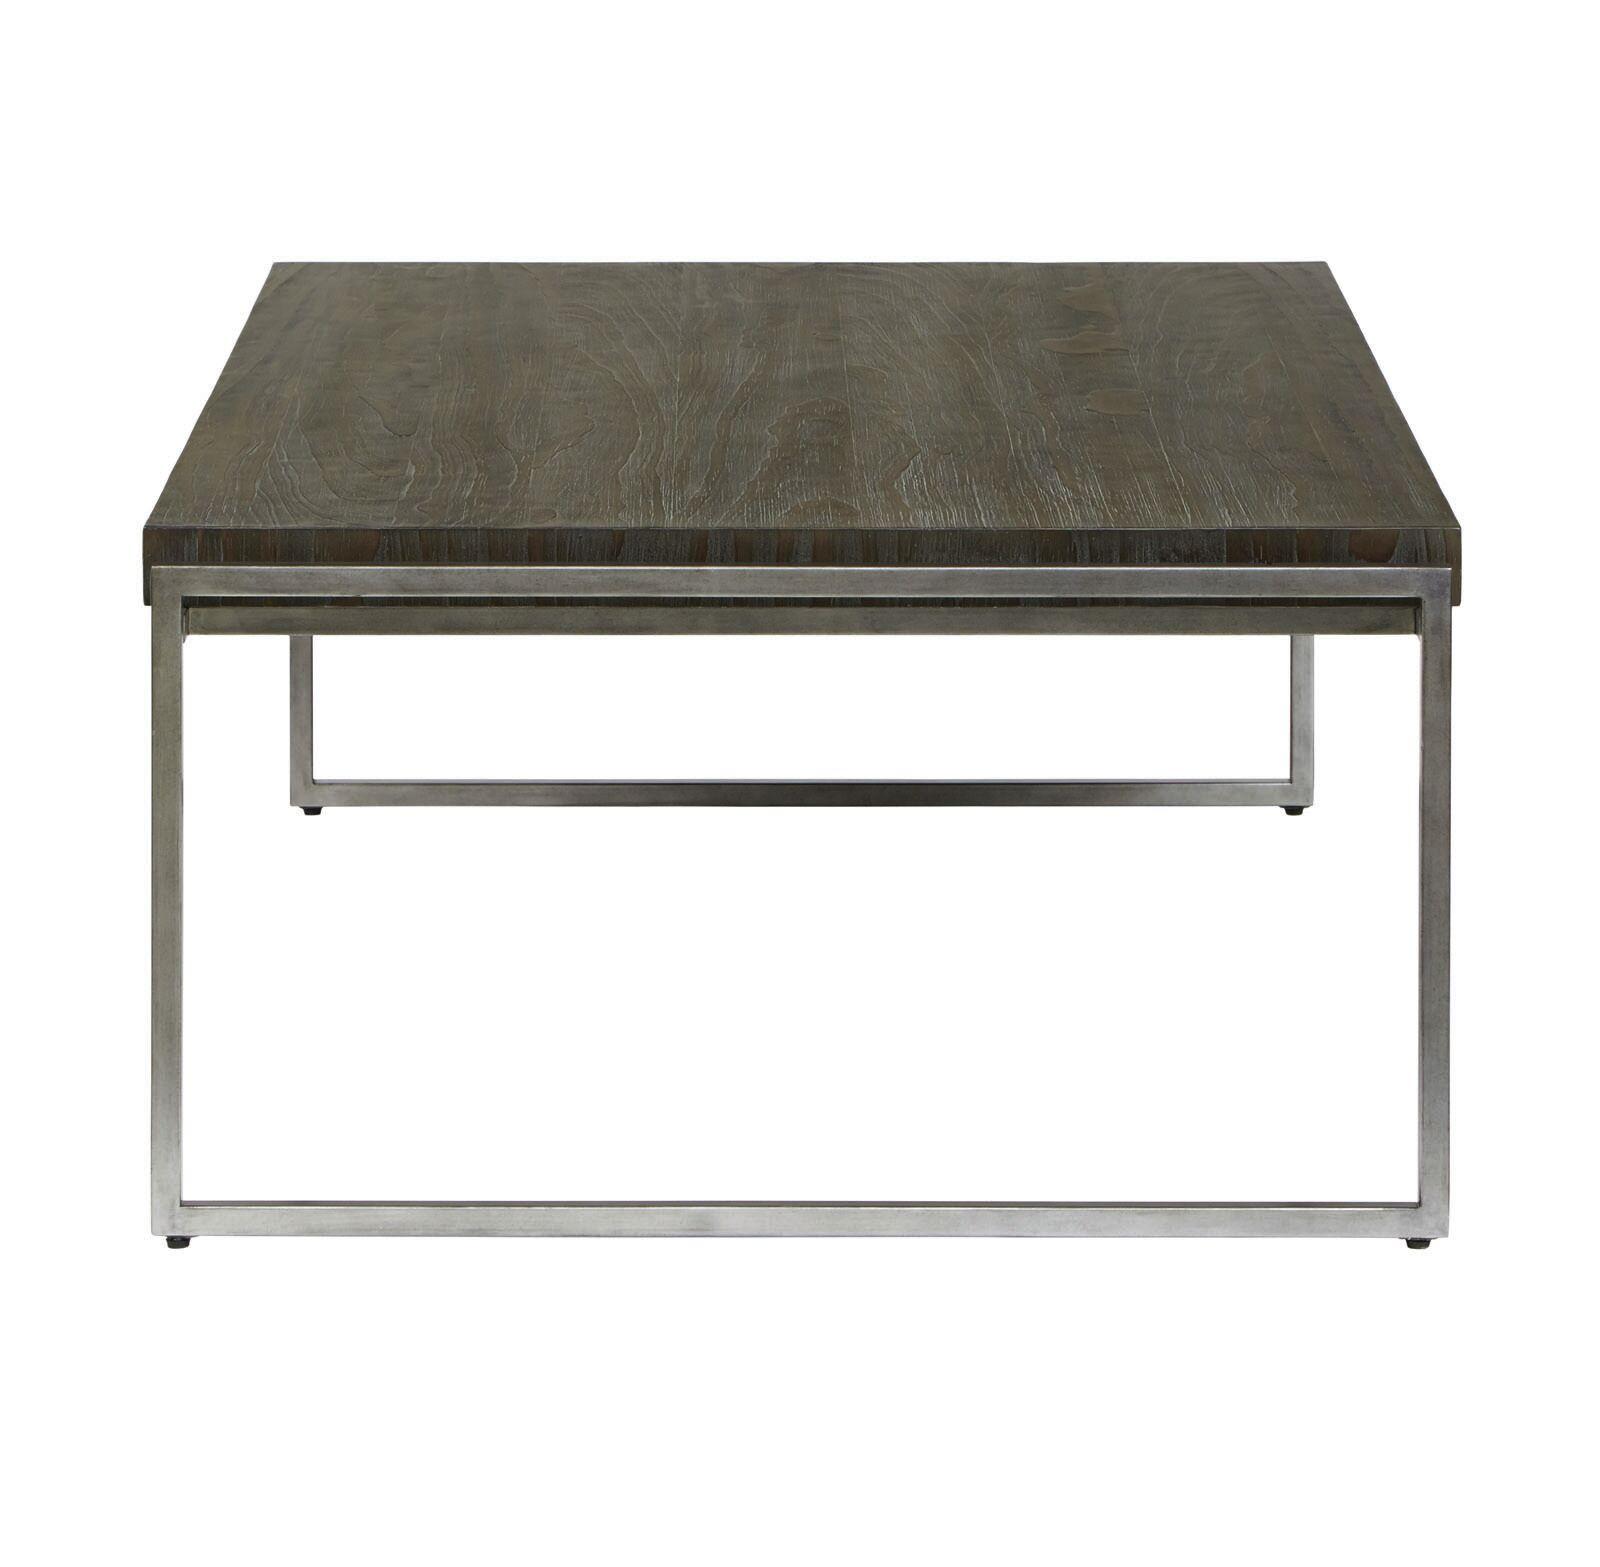 Liverman 3 Piece Coffee Table Set